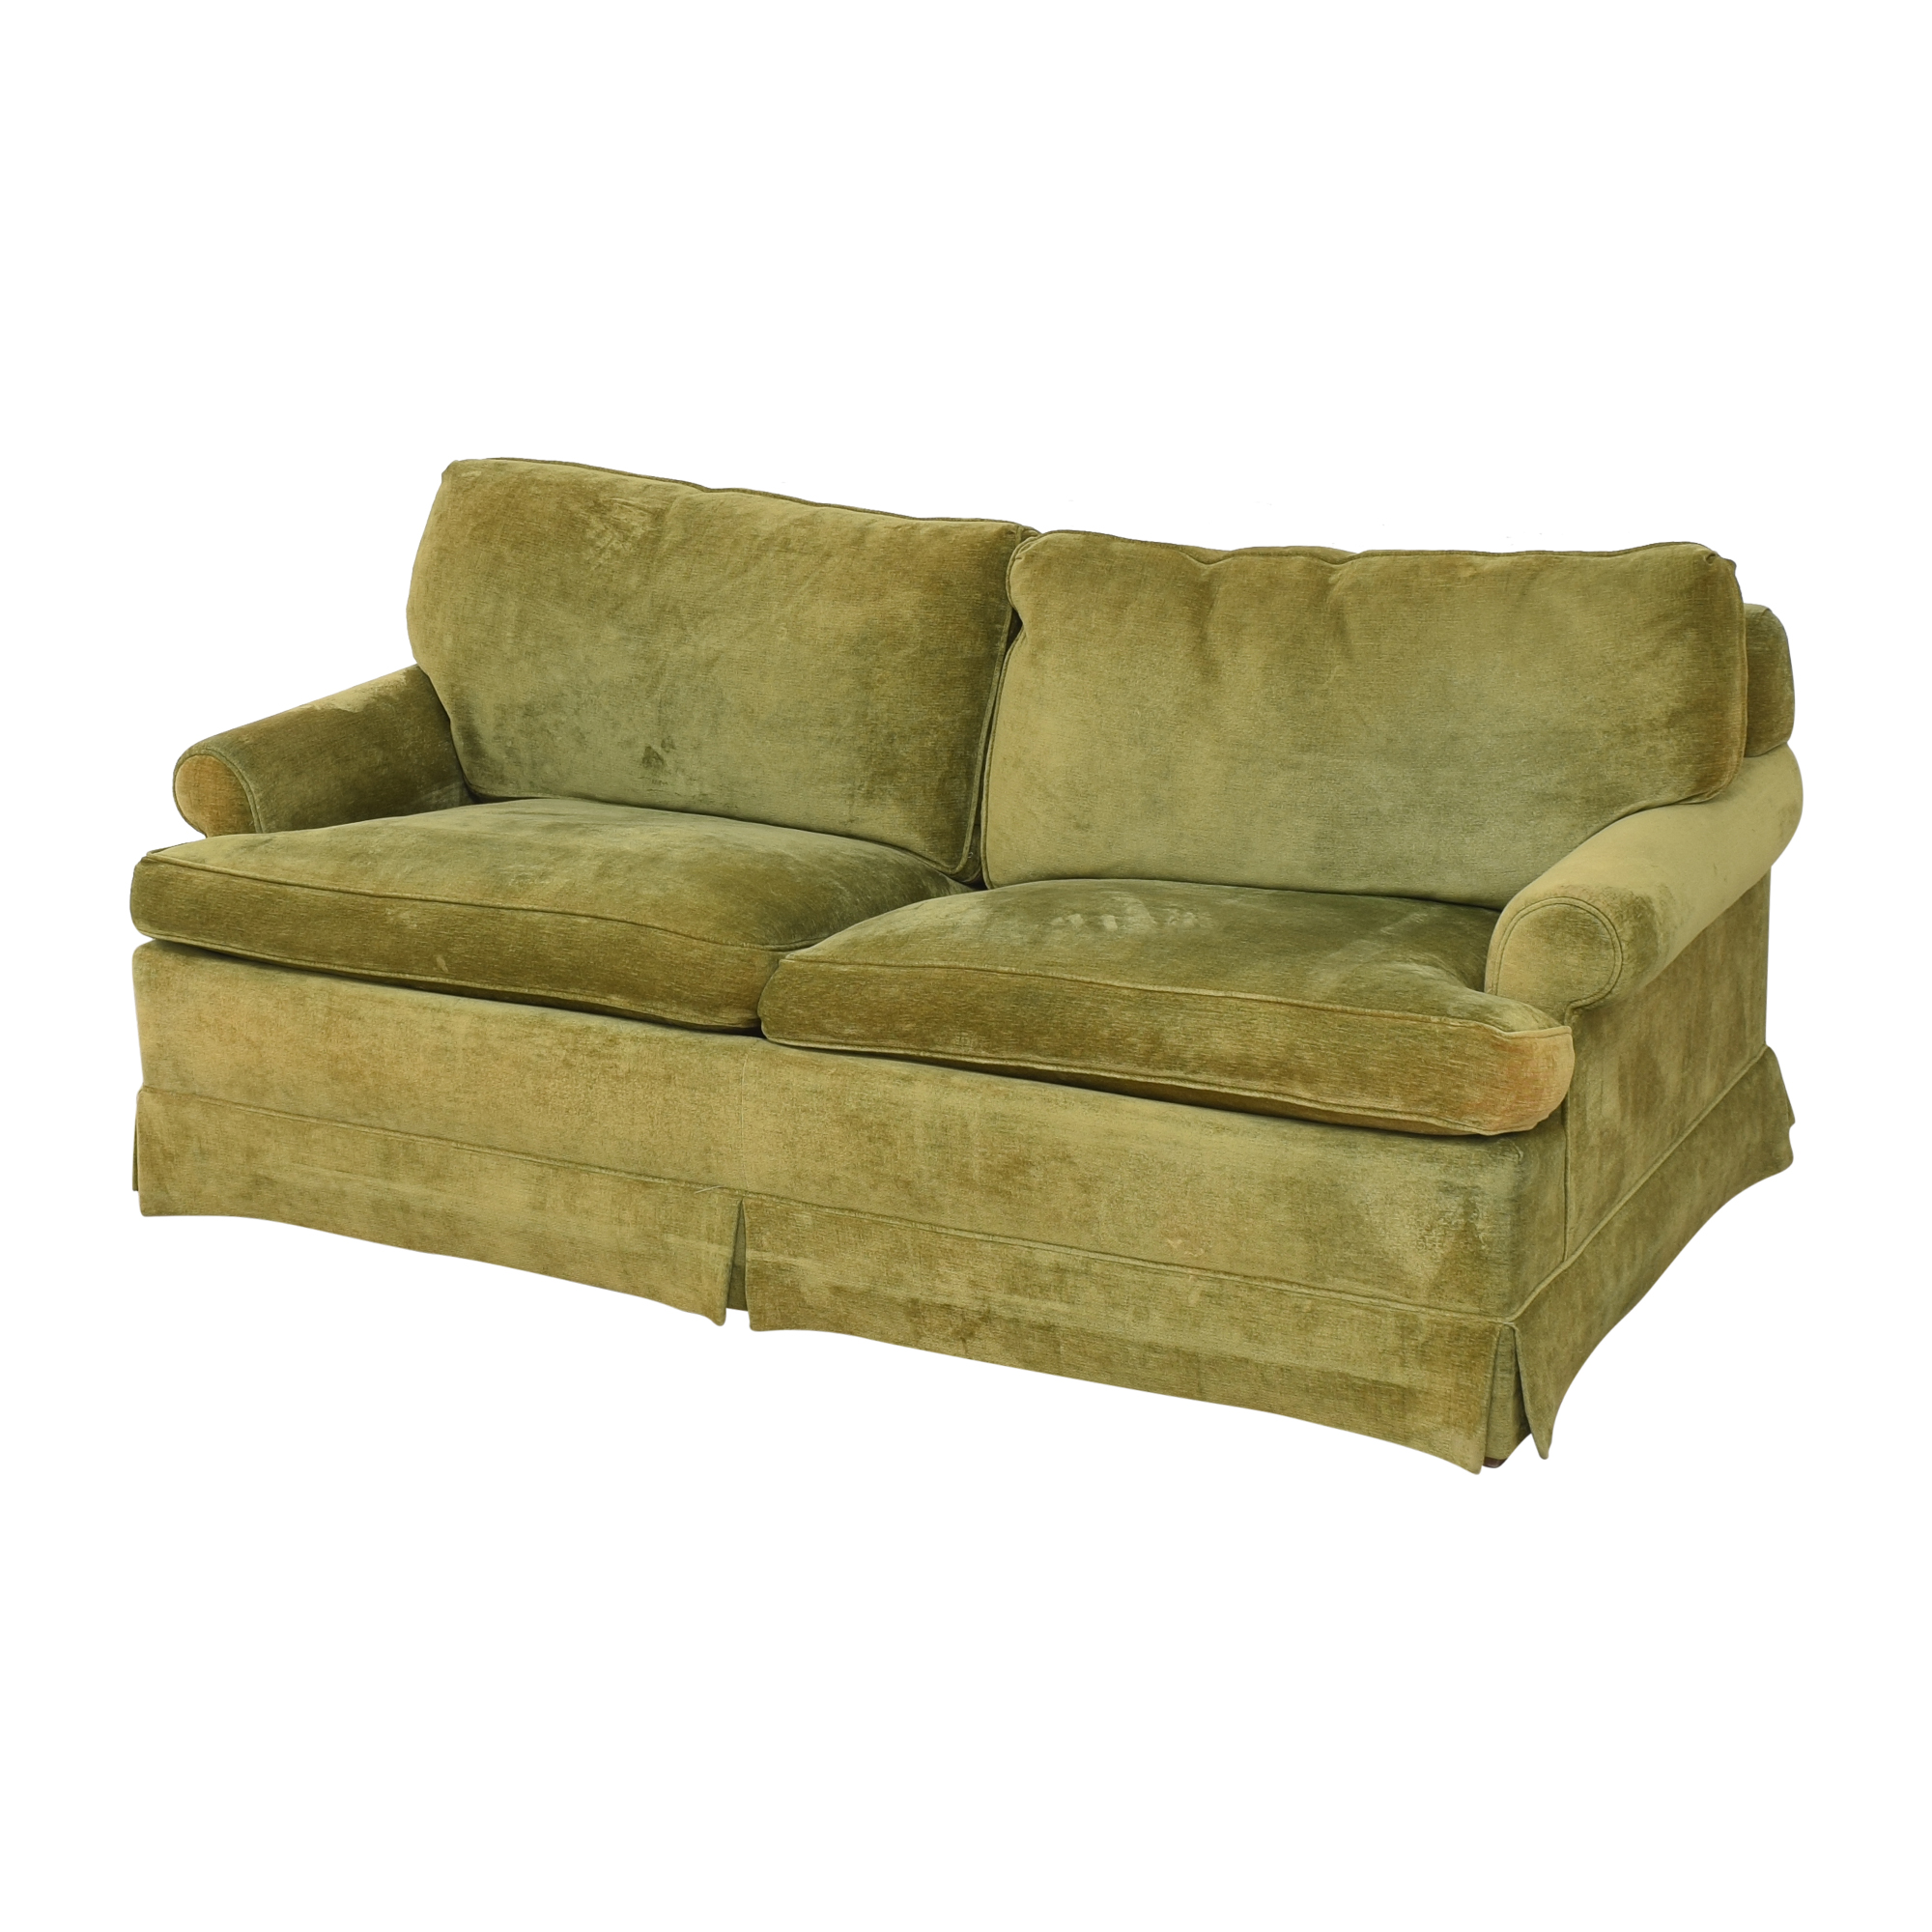 shop Hickory Springs Two Cushion Sleeper Sofa Hickory Springs